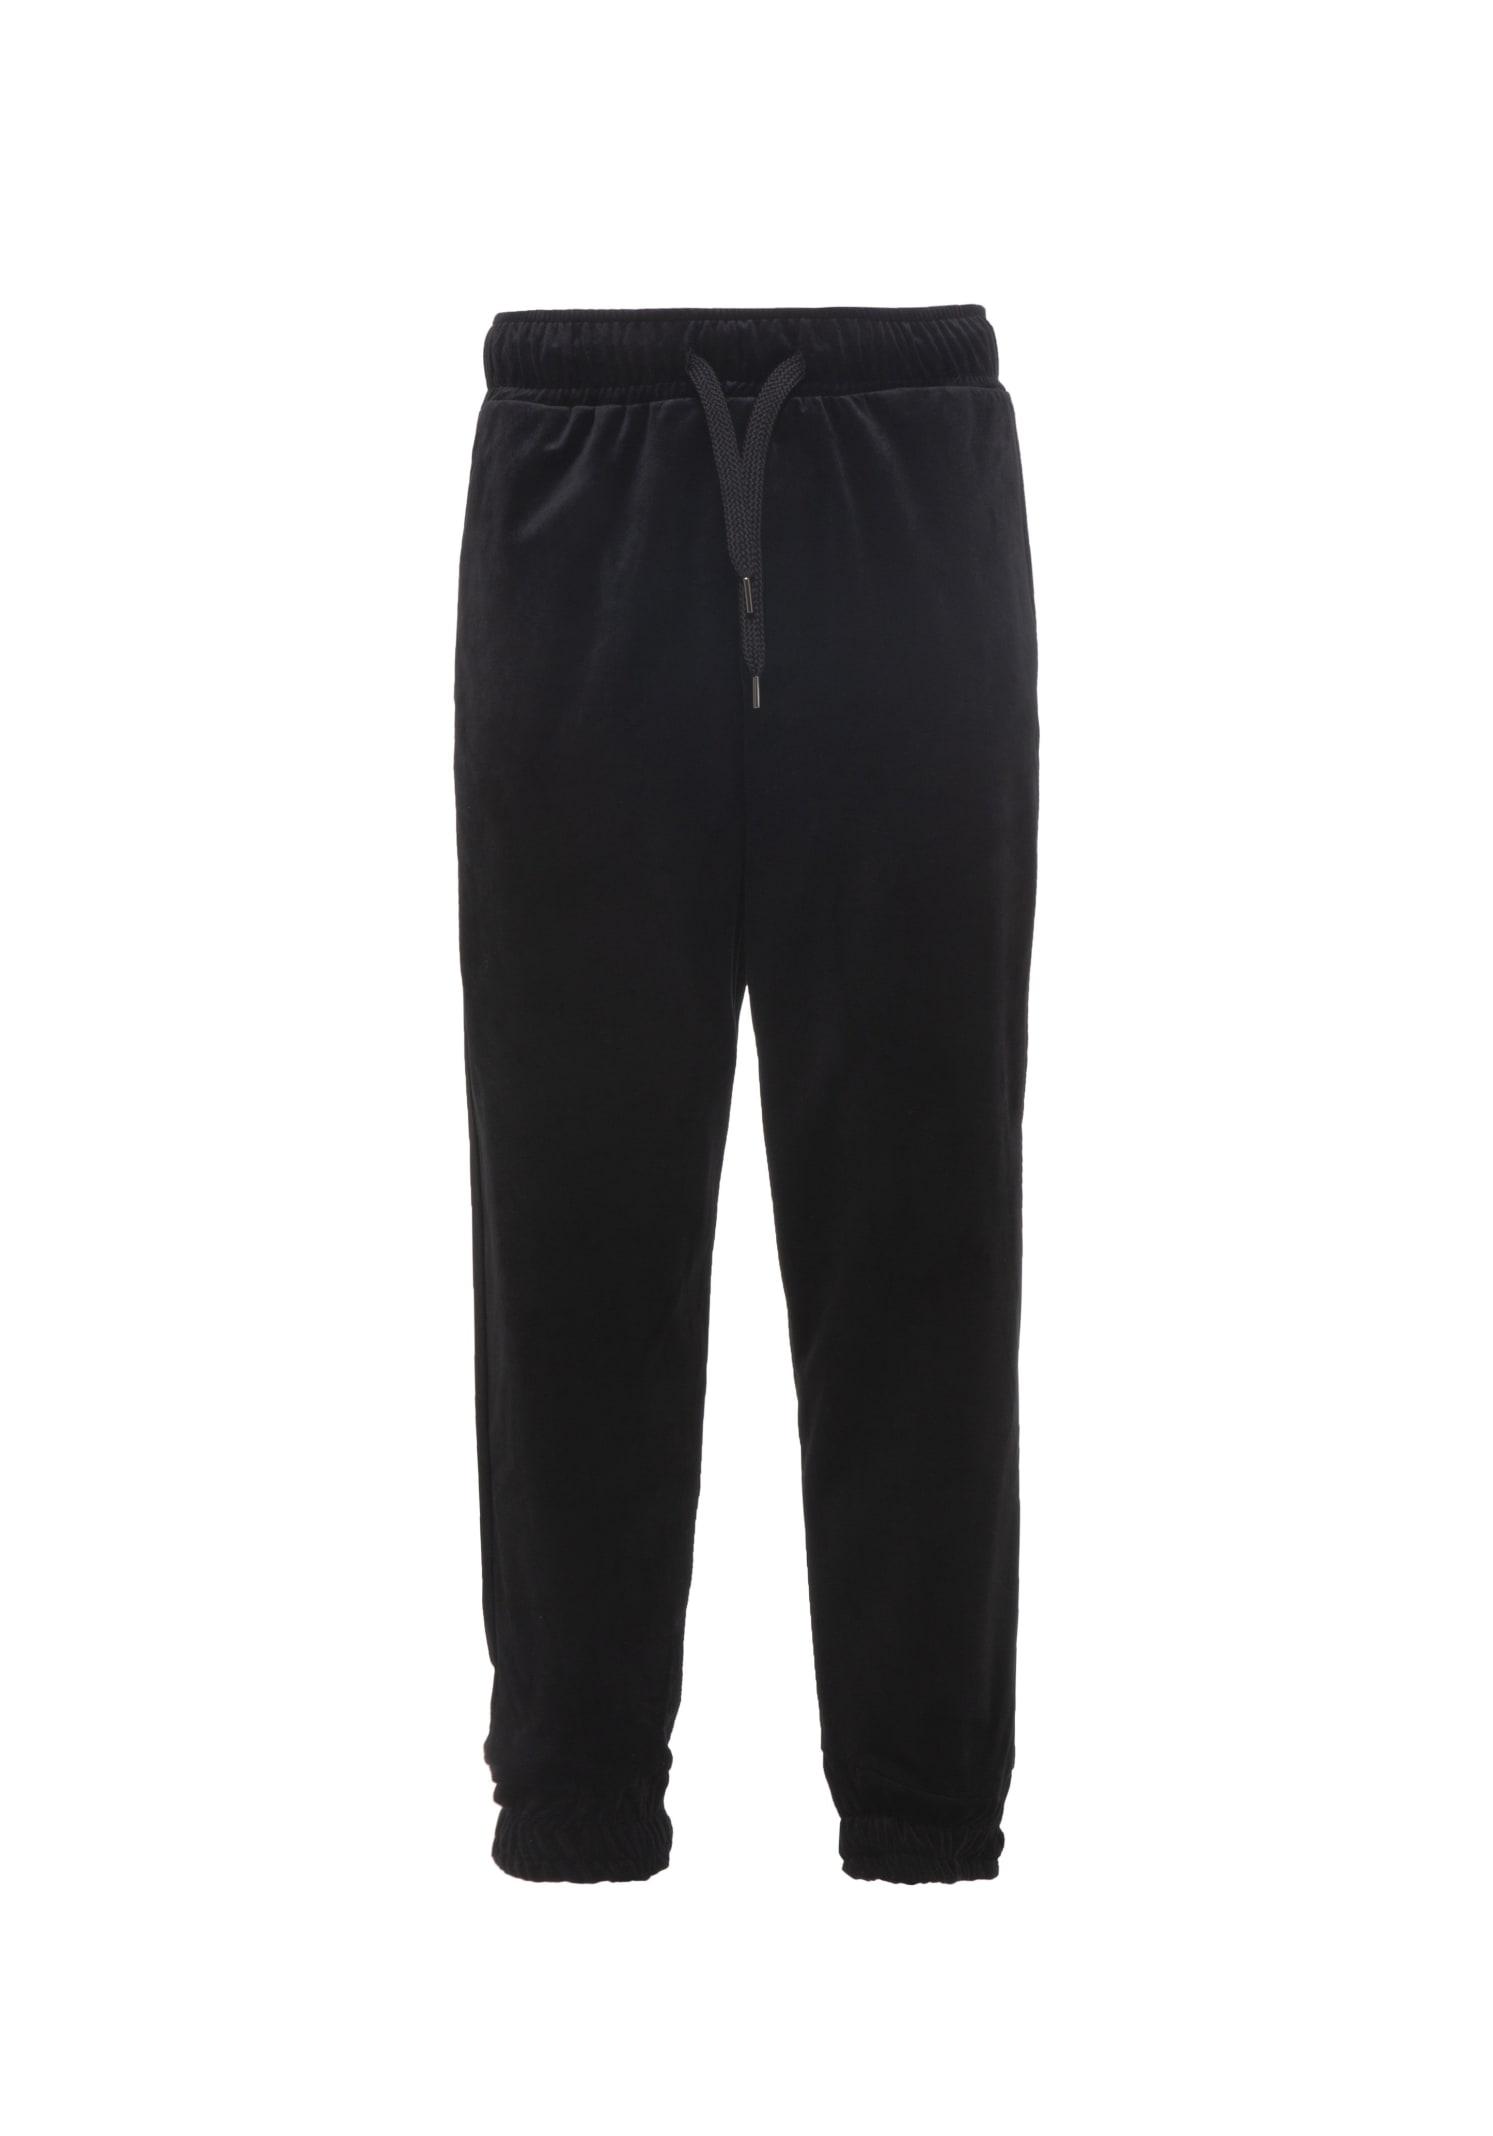 Pants Velour Black